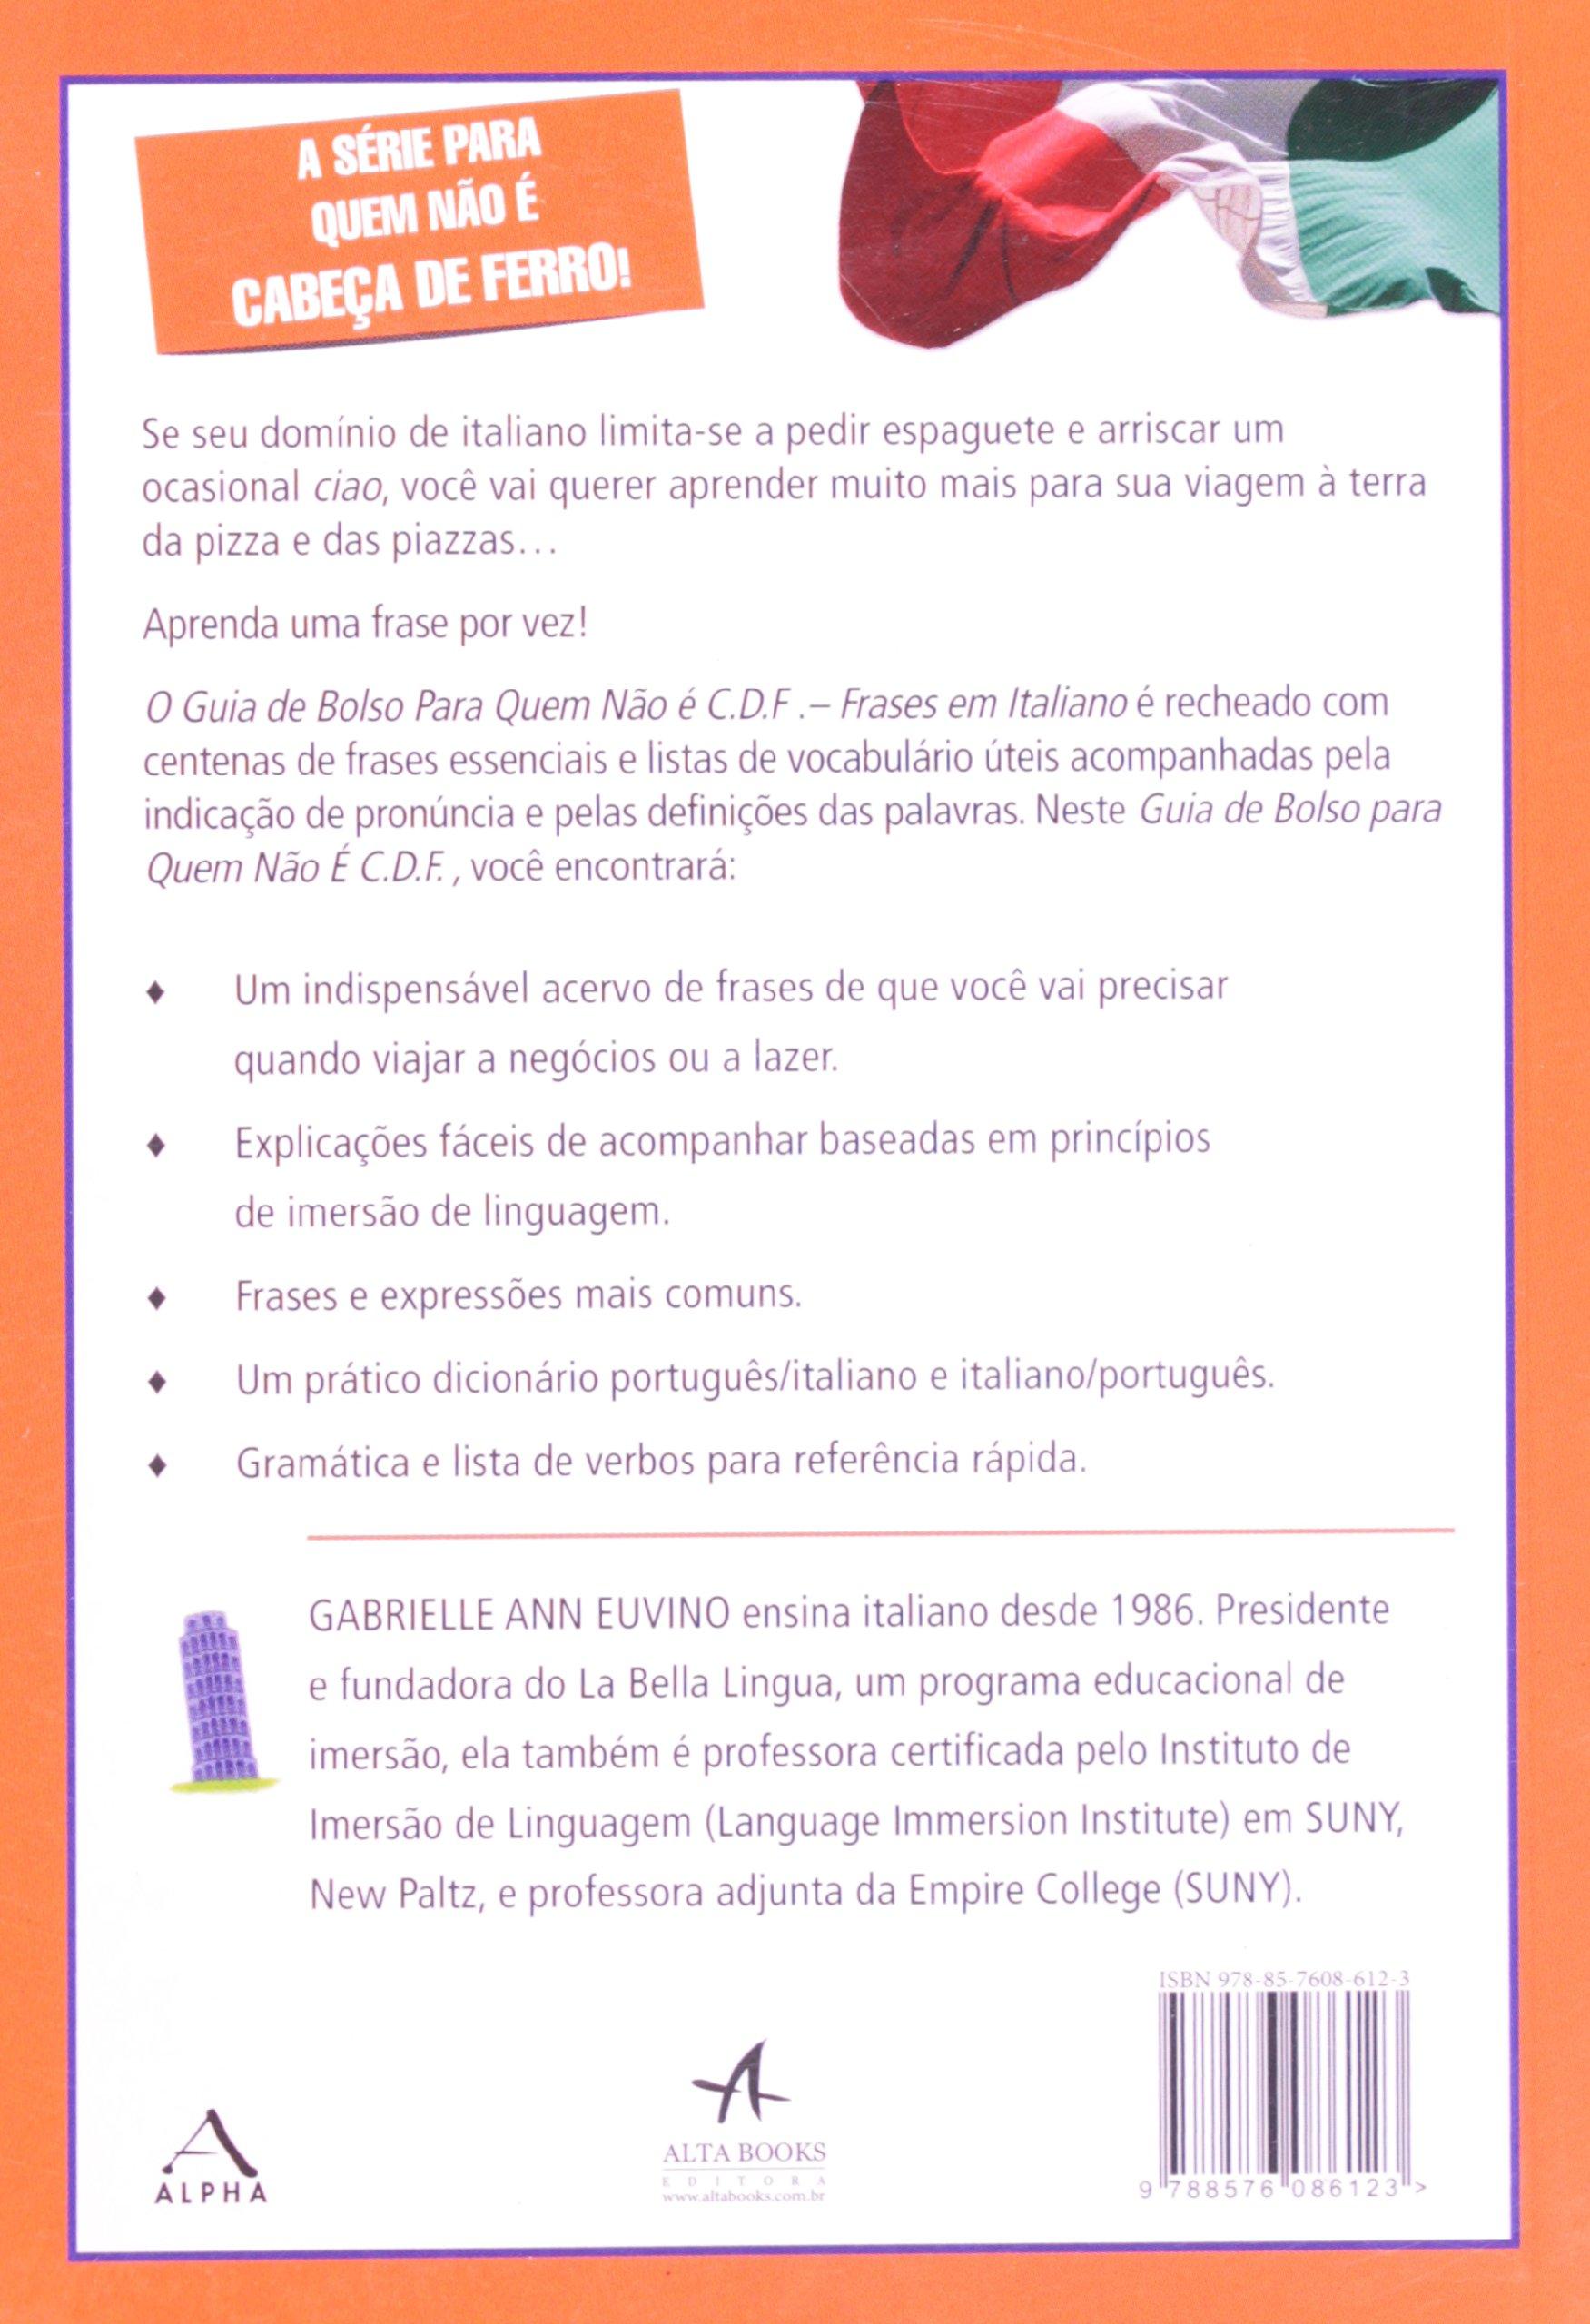 Frases Em Italiano Cdf Em Portuguese Do Brasil Amazon